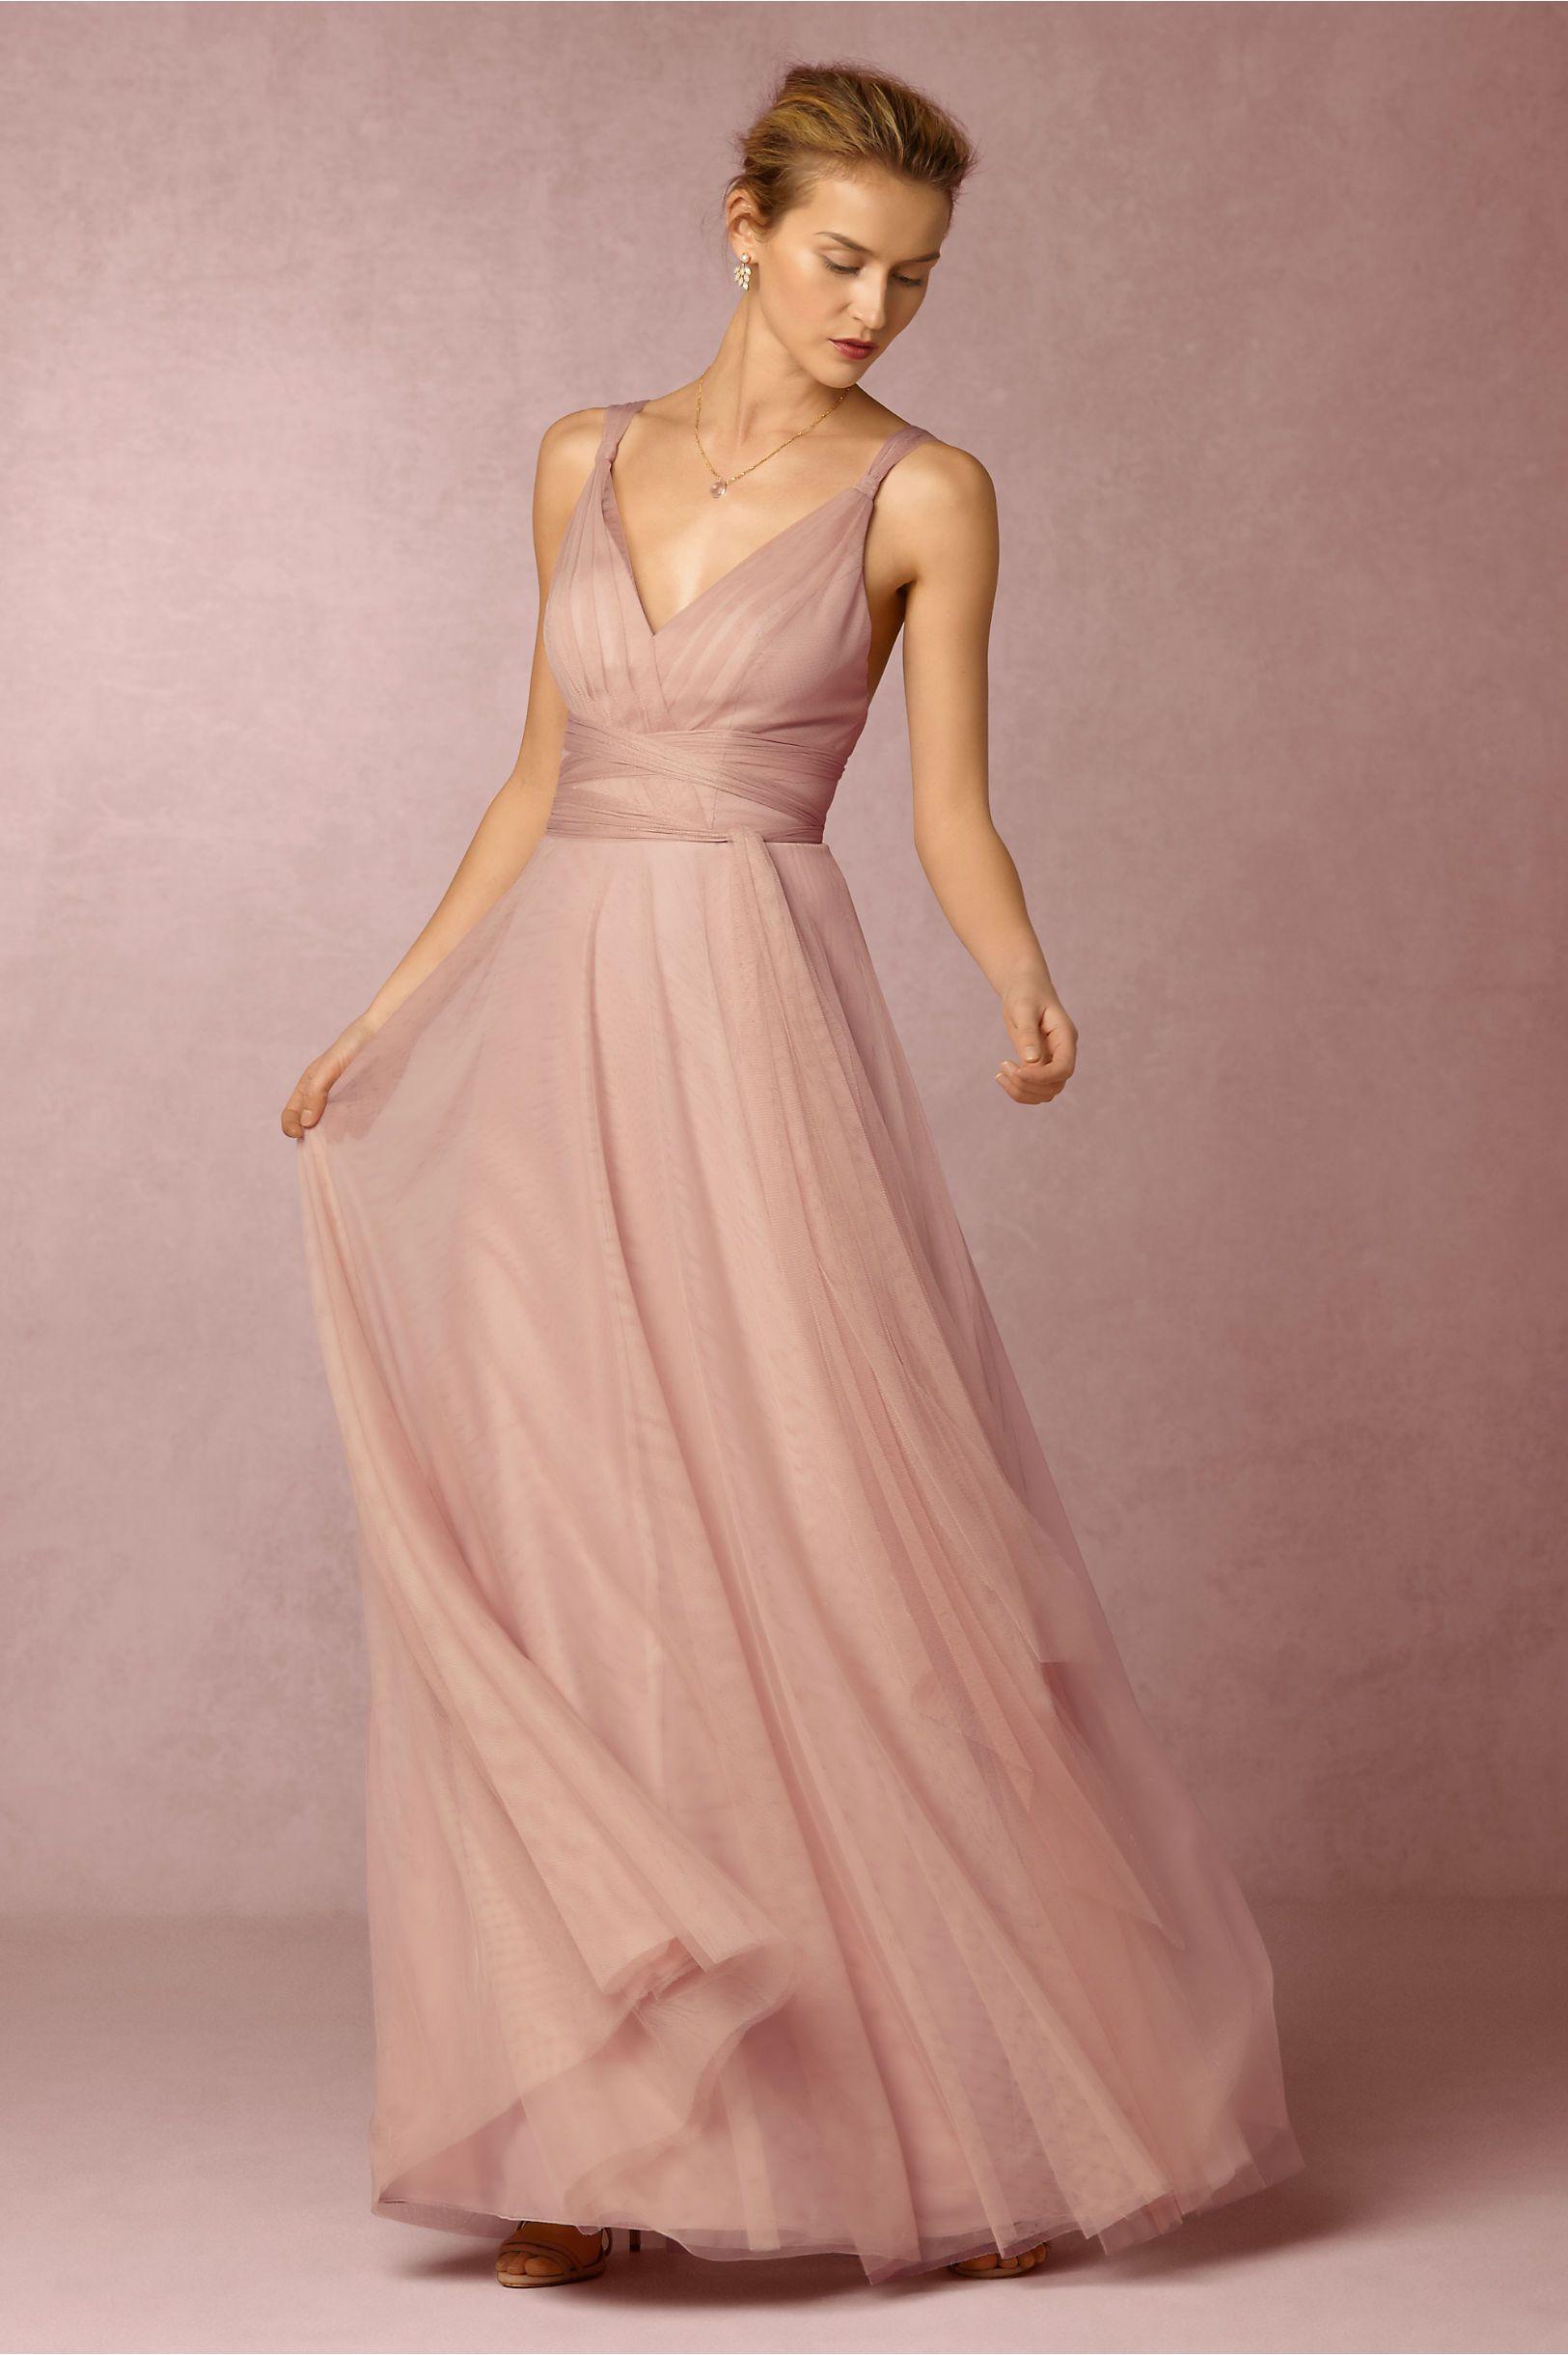 Bhldn zaria dress in bridesmaids bridesmaid dresses long at bhldn bhldn zaria dress in bridesmaids bridesmaid dresses long at bhldn ombrellifo Images